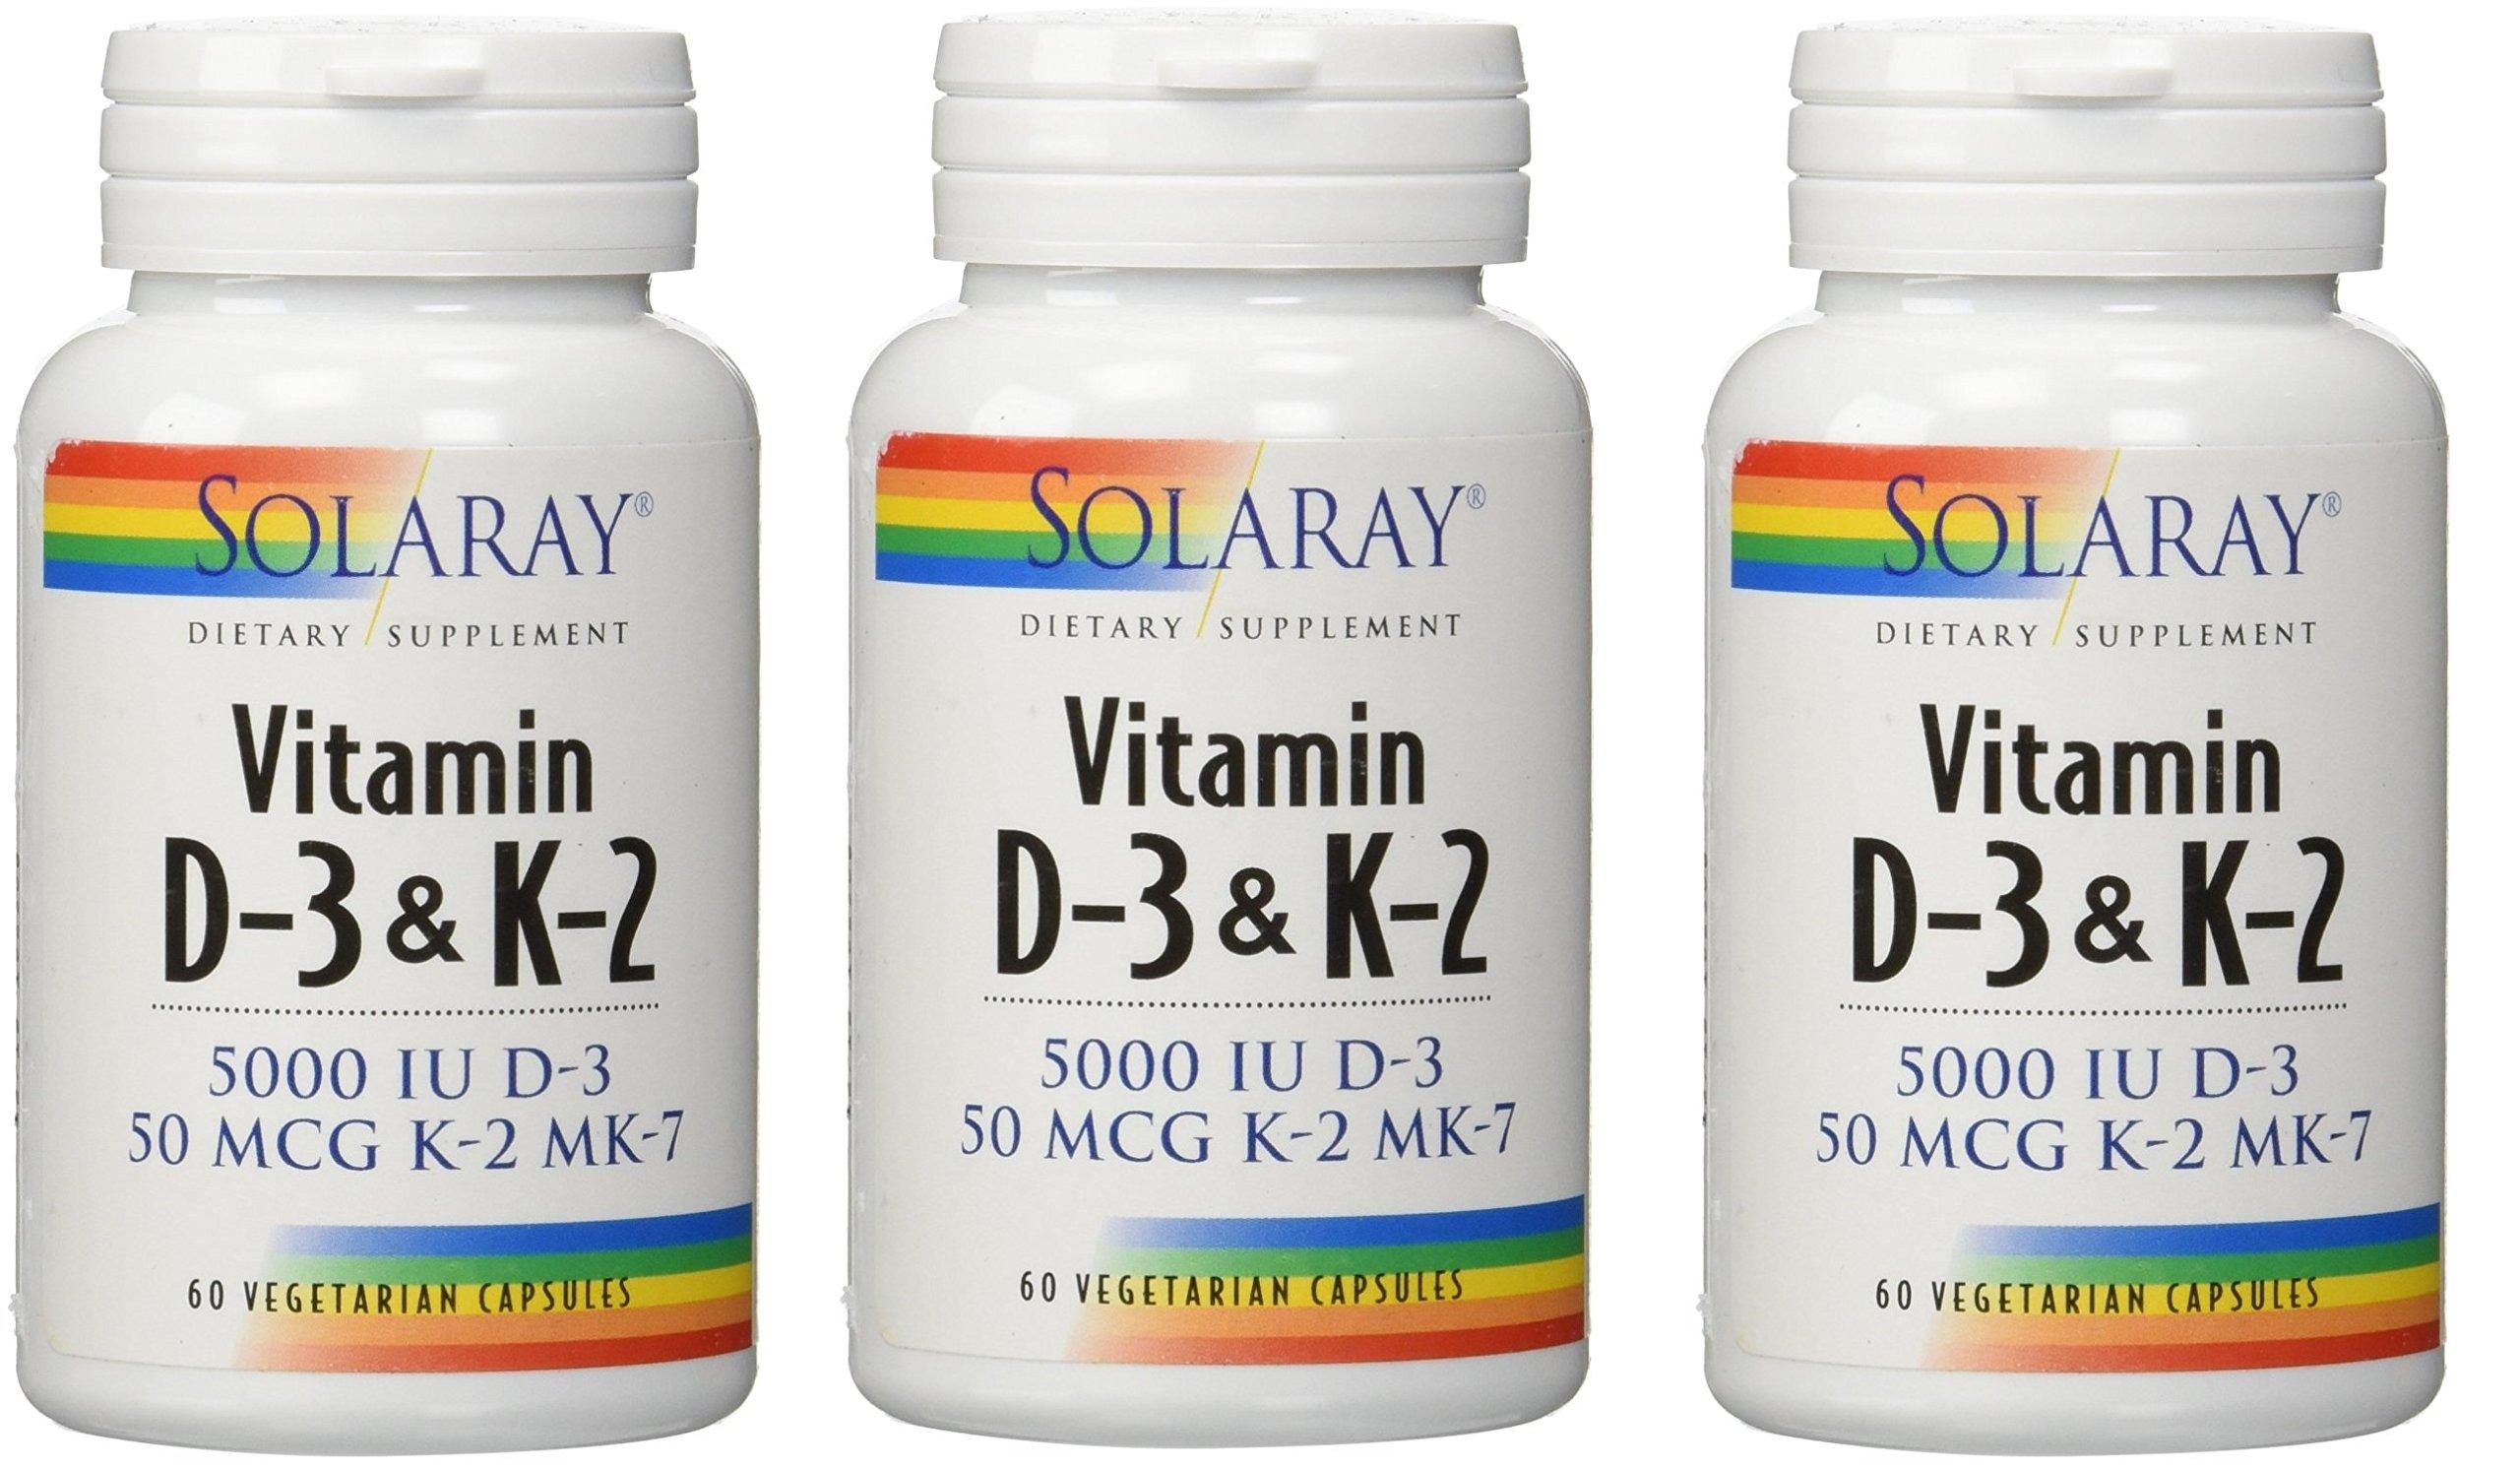 Solaray Vitamin D-3 & K-2 -- 60 Vegetarian Capsules ...